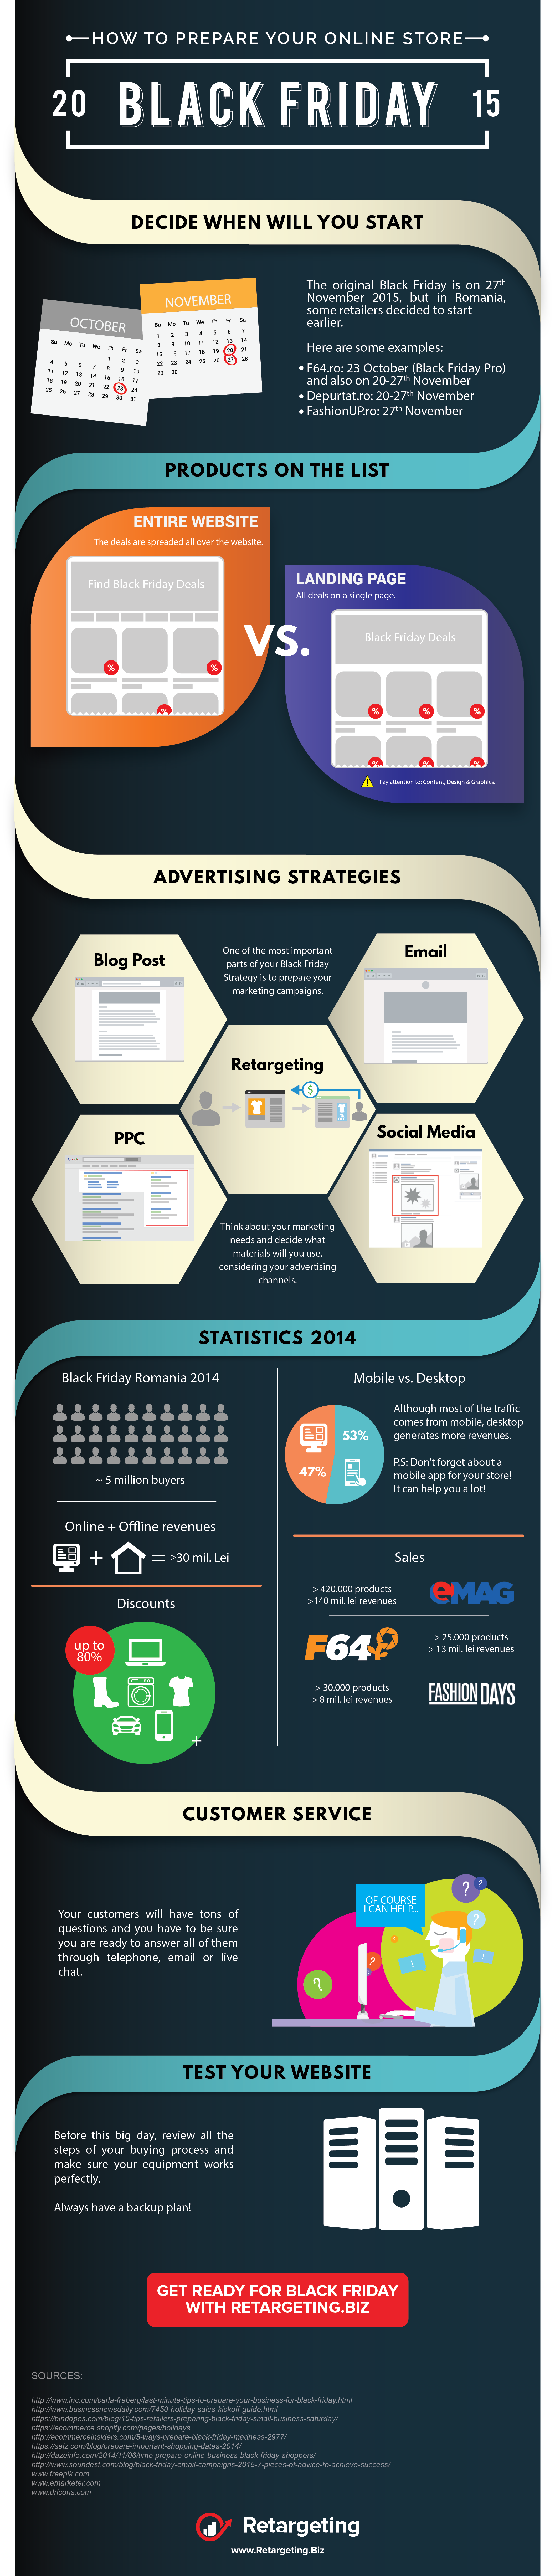 infografic-bf